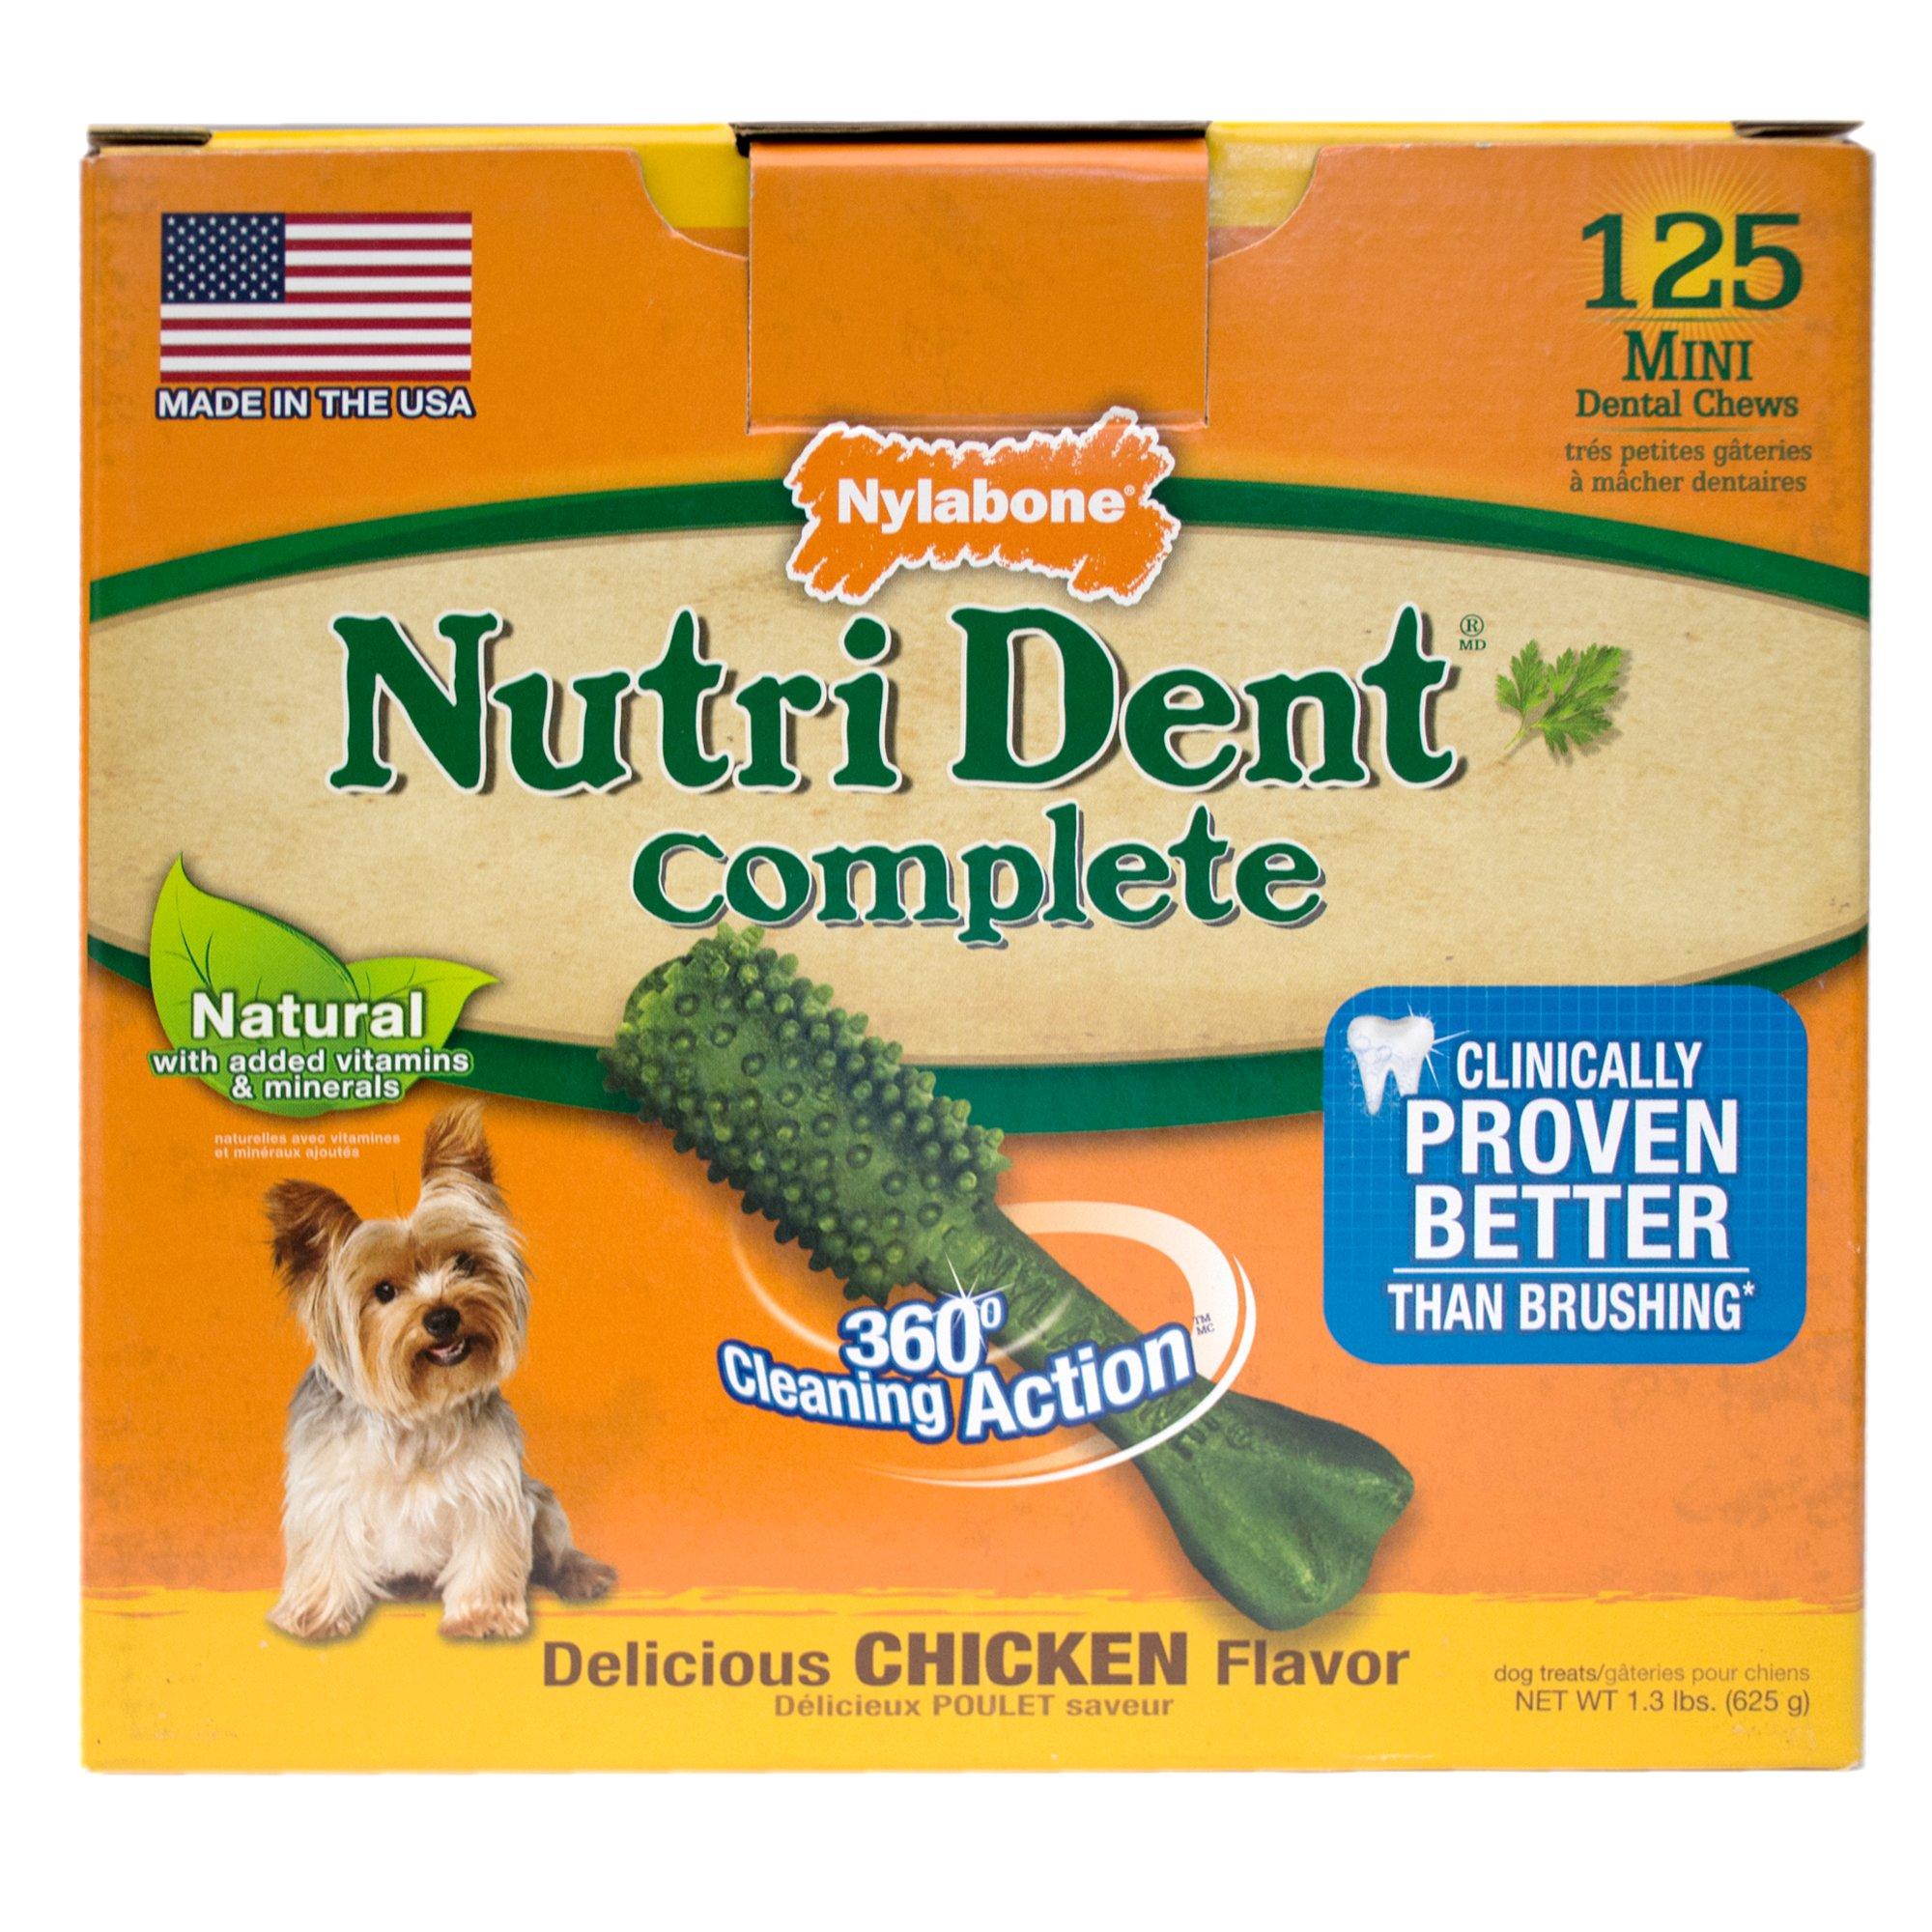 Nylabone Nutri Dent Complete Dental Chew for Dogs